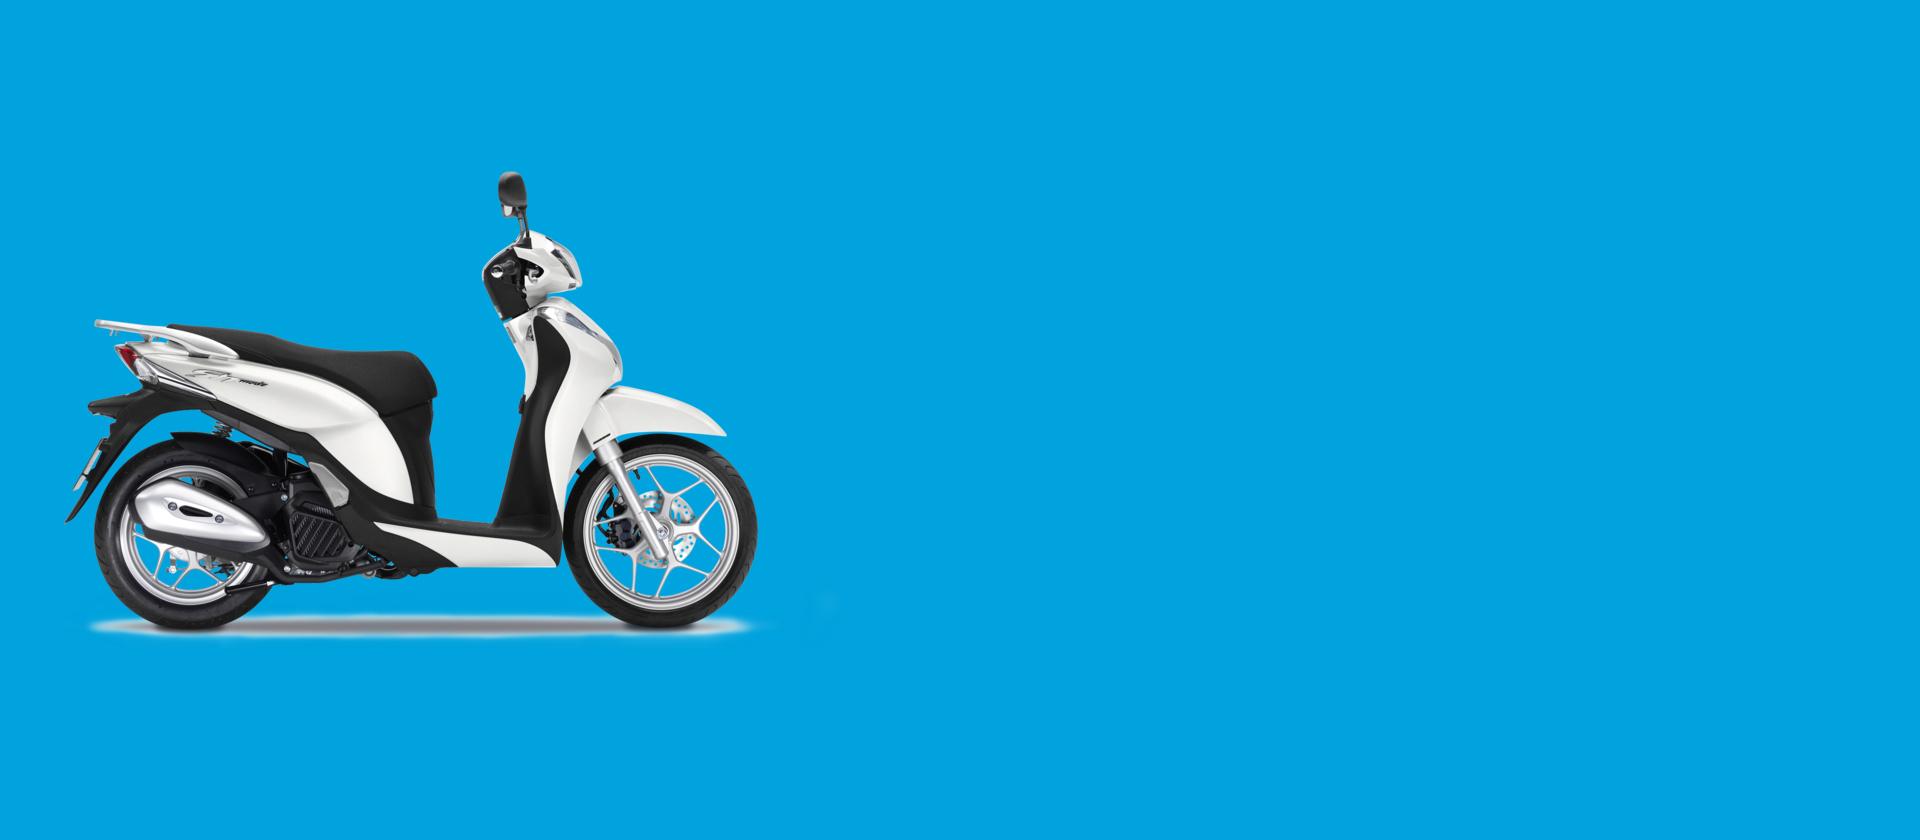 2017 Motorbike Models